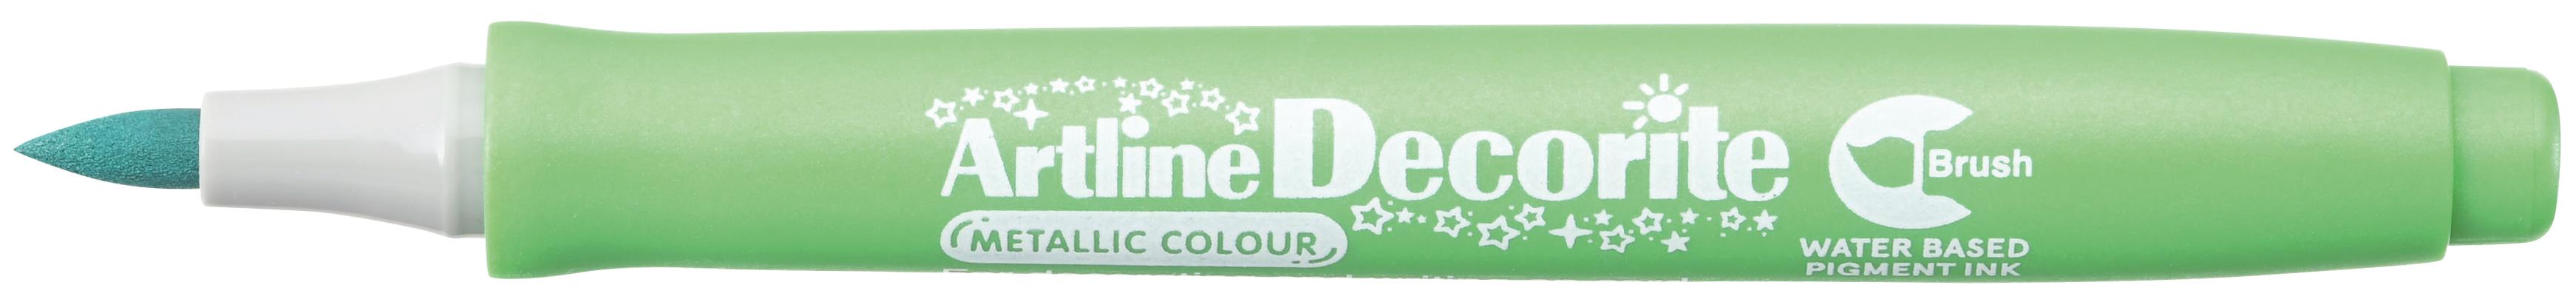 Artline Decorite Brush Metallic Grønn